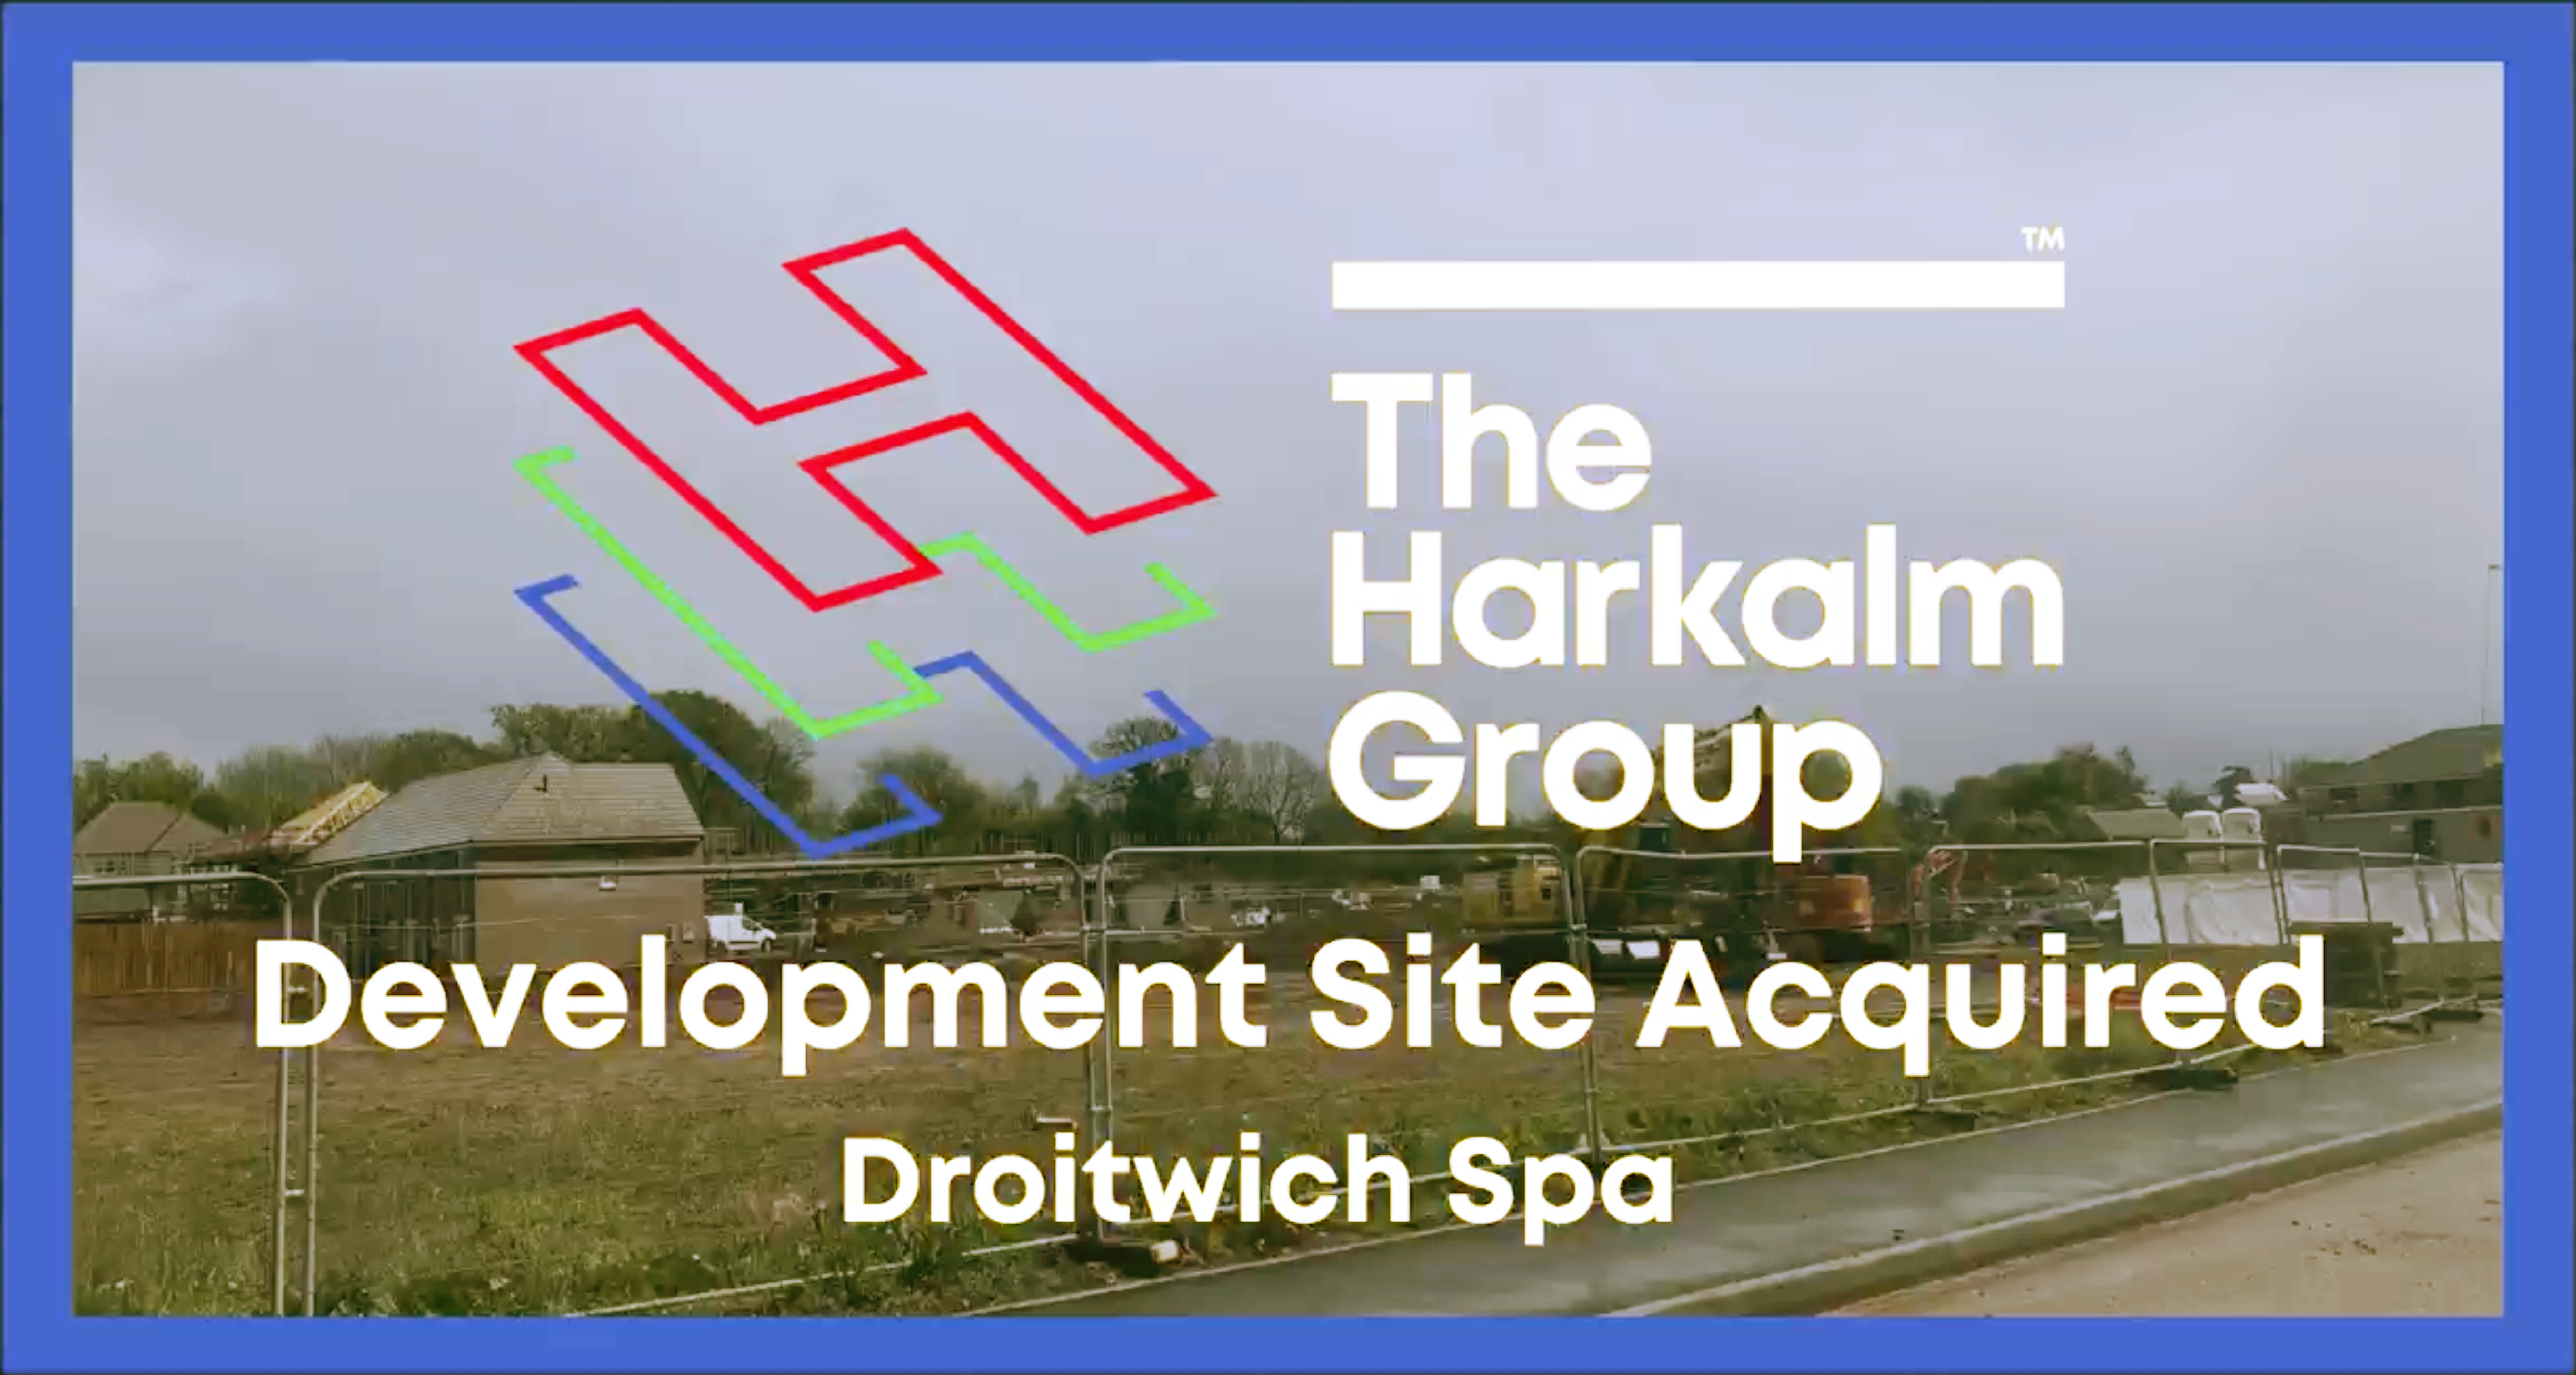 New development site acquired in Droitwich